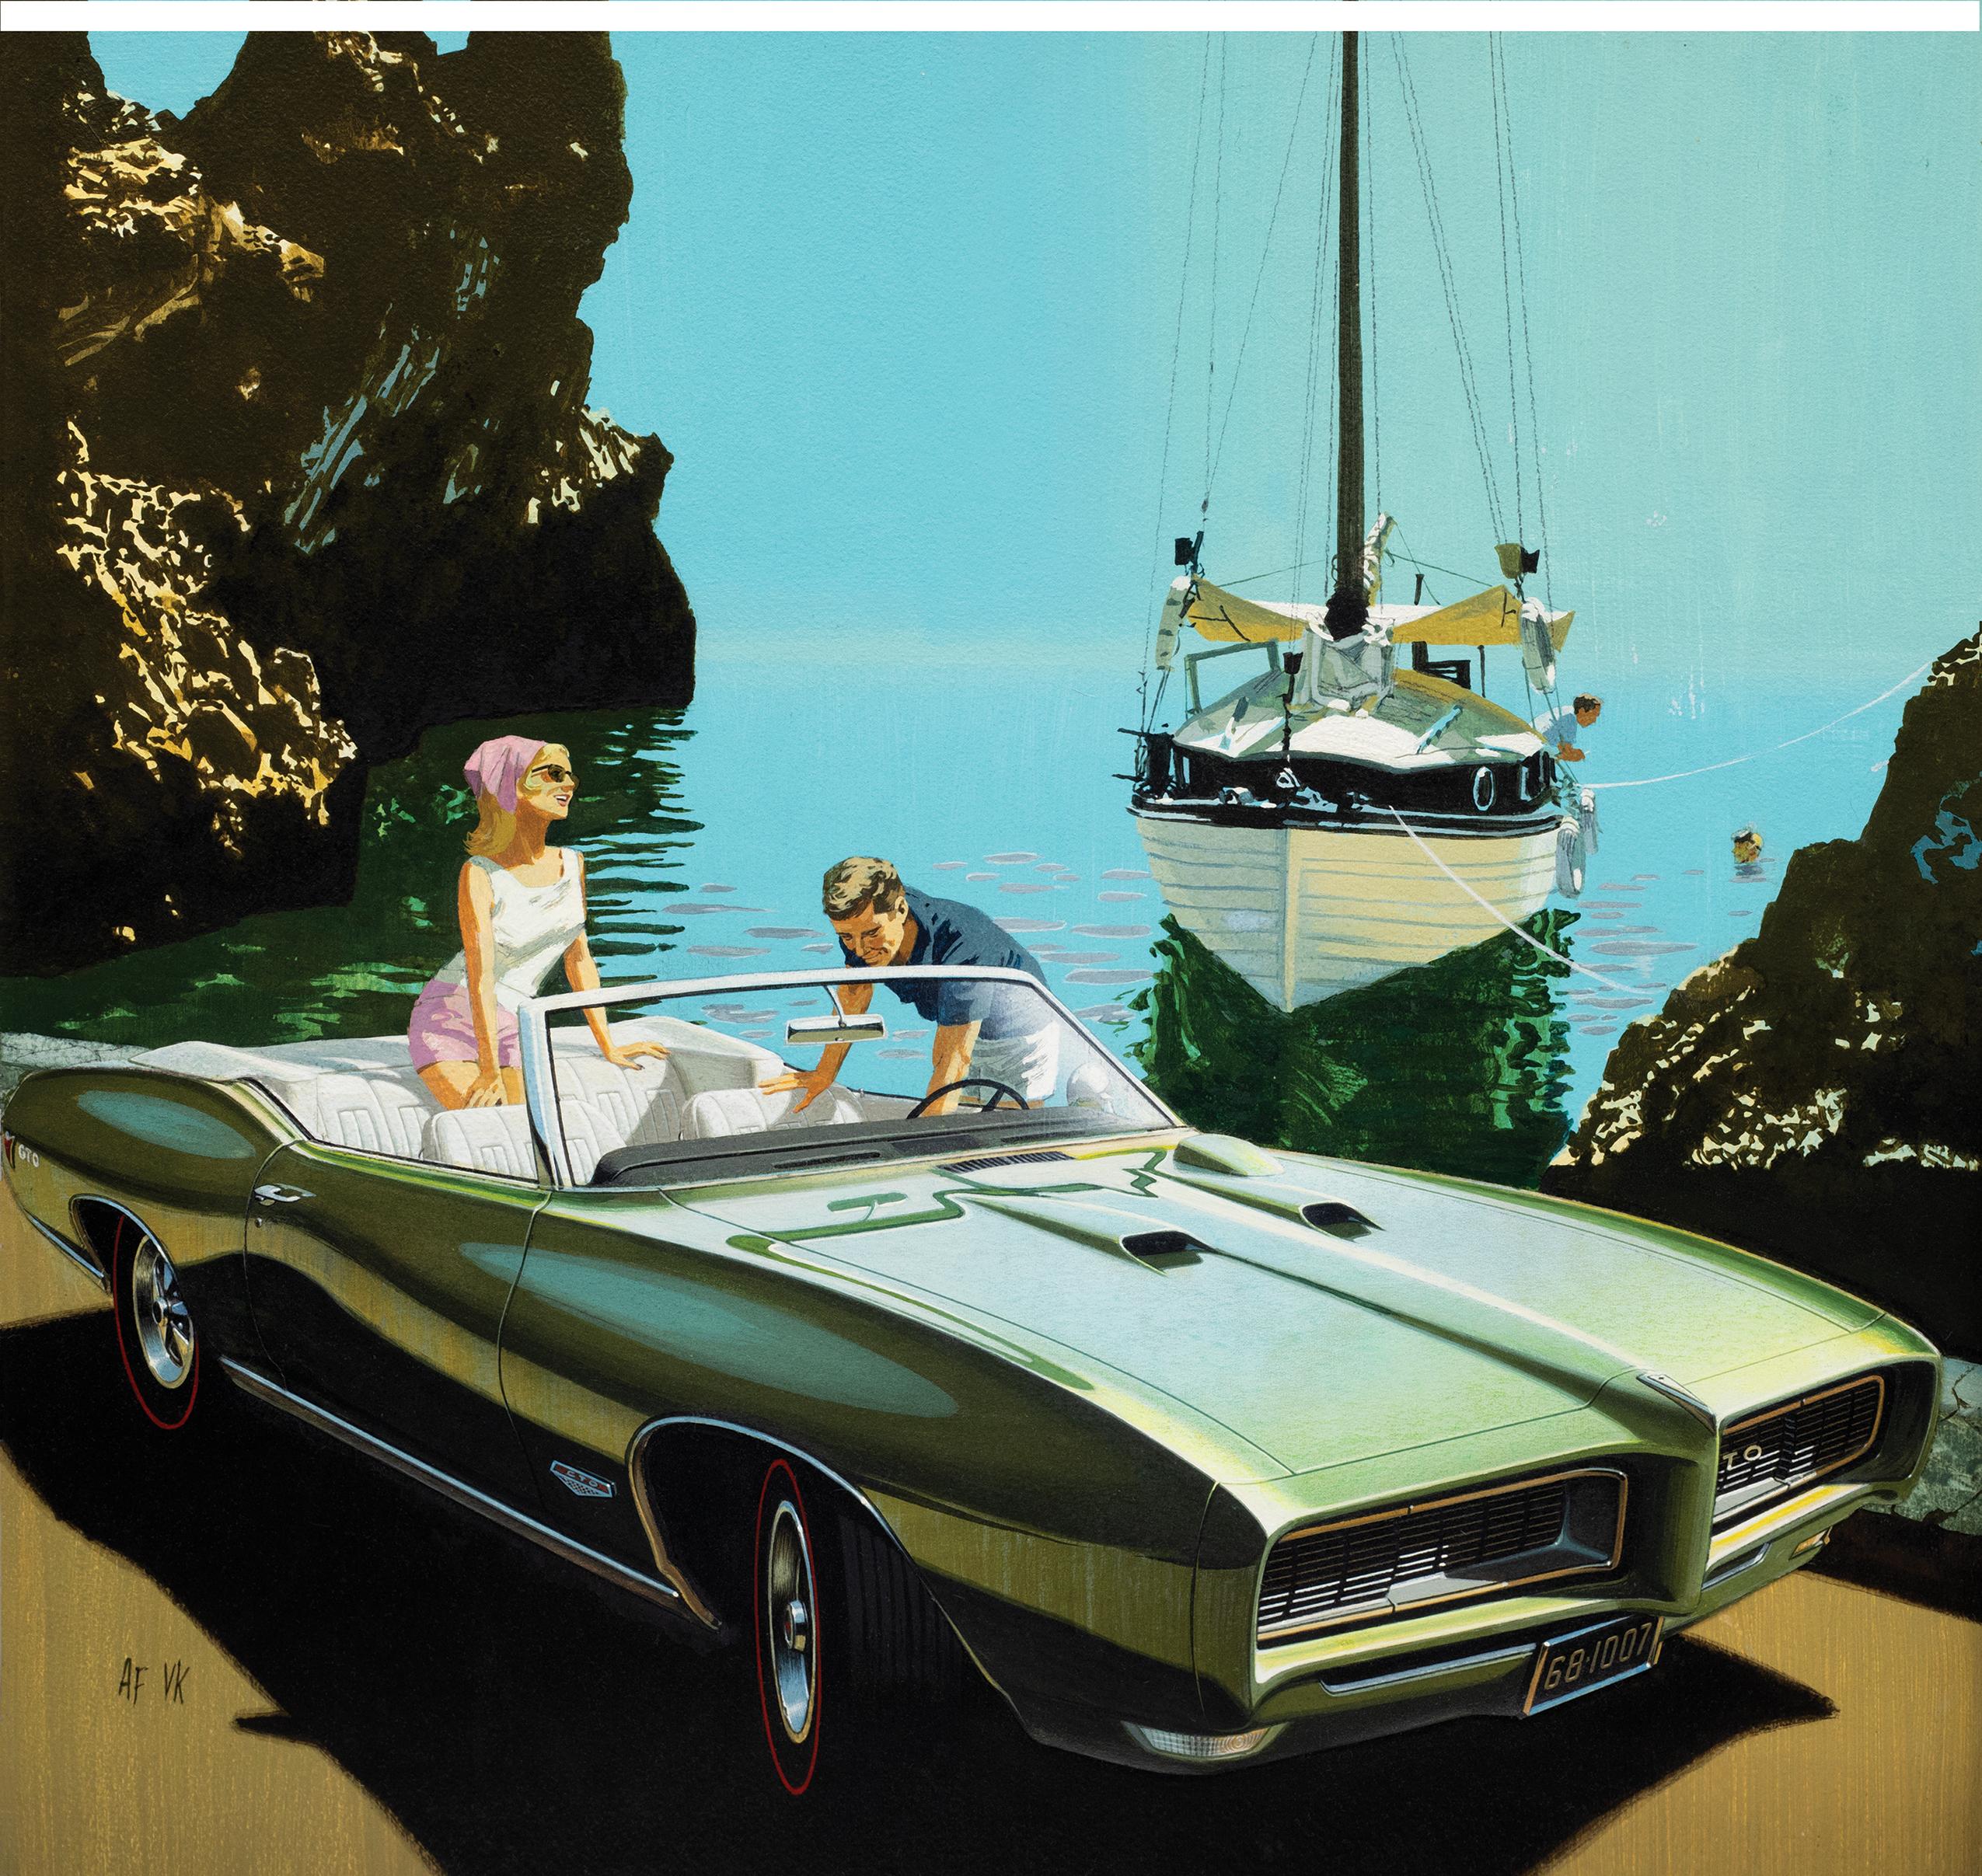 Fitz and Van - 1968 Pontiac GTO Corfu Cove